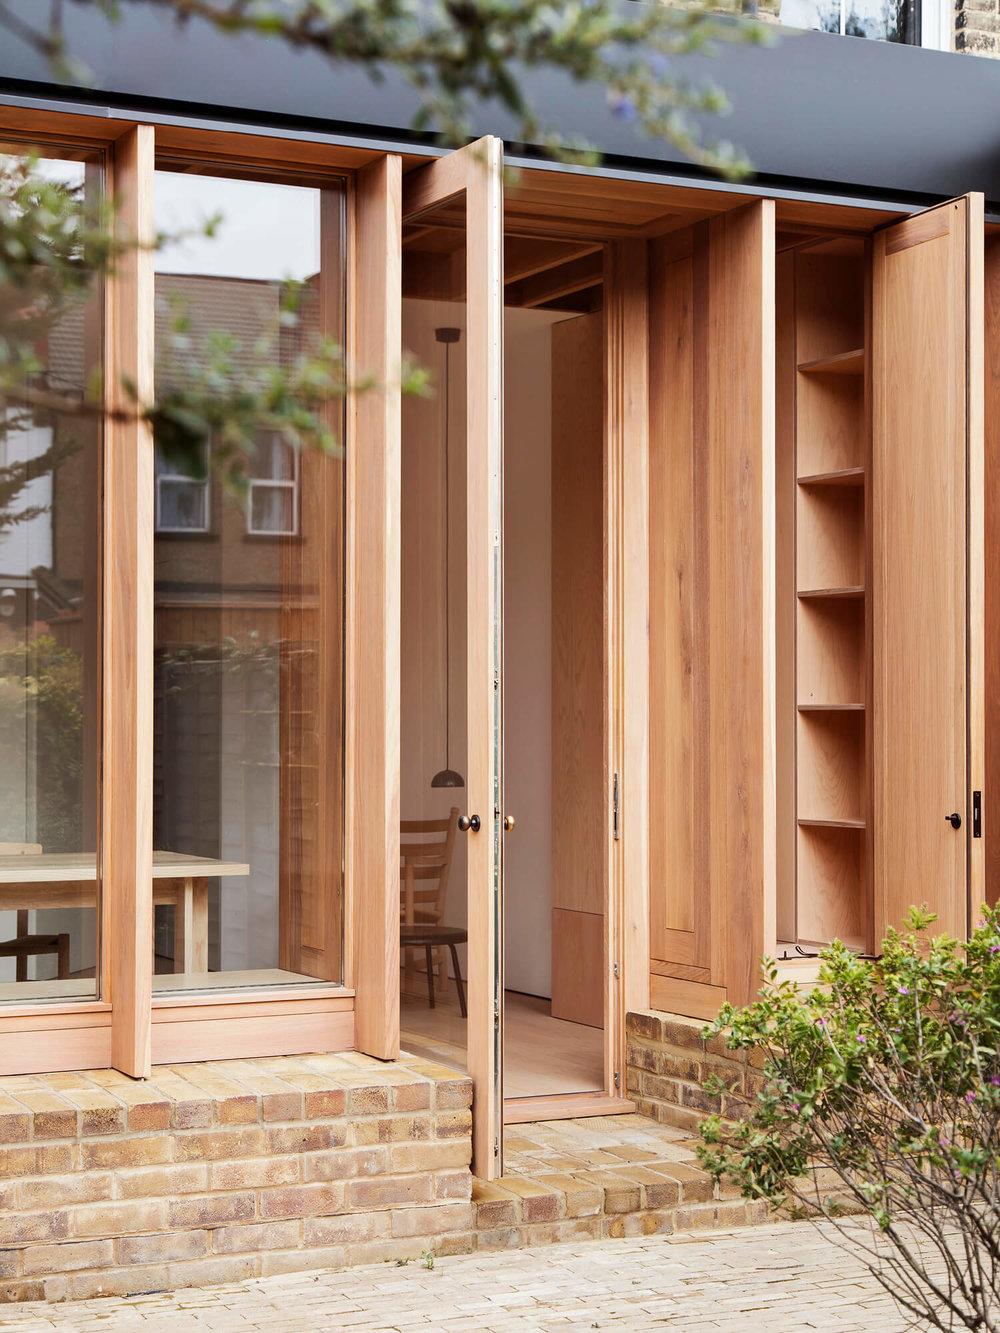 est-living-dewsbury-road-o-sullivan-architects-04.jpg